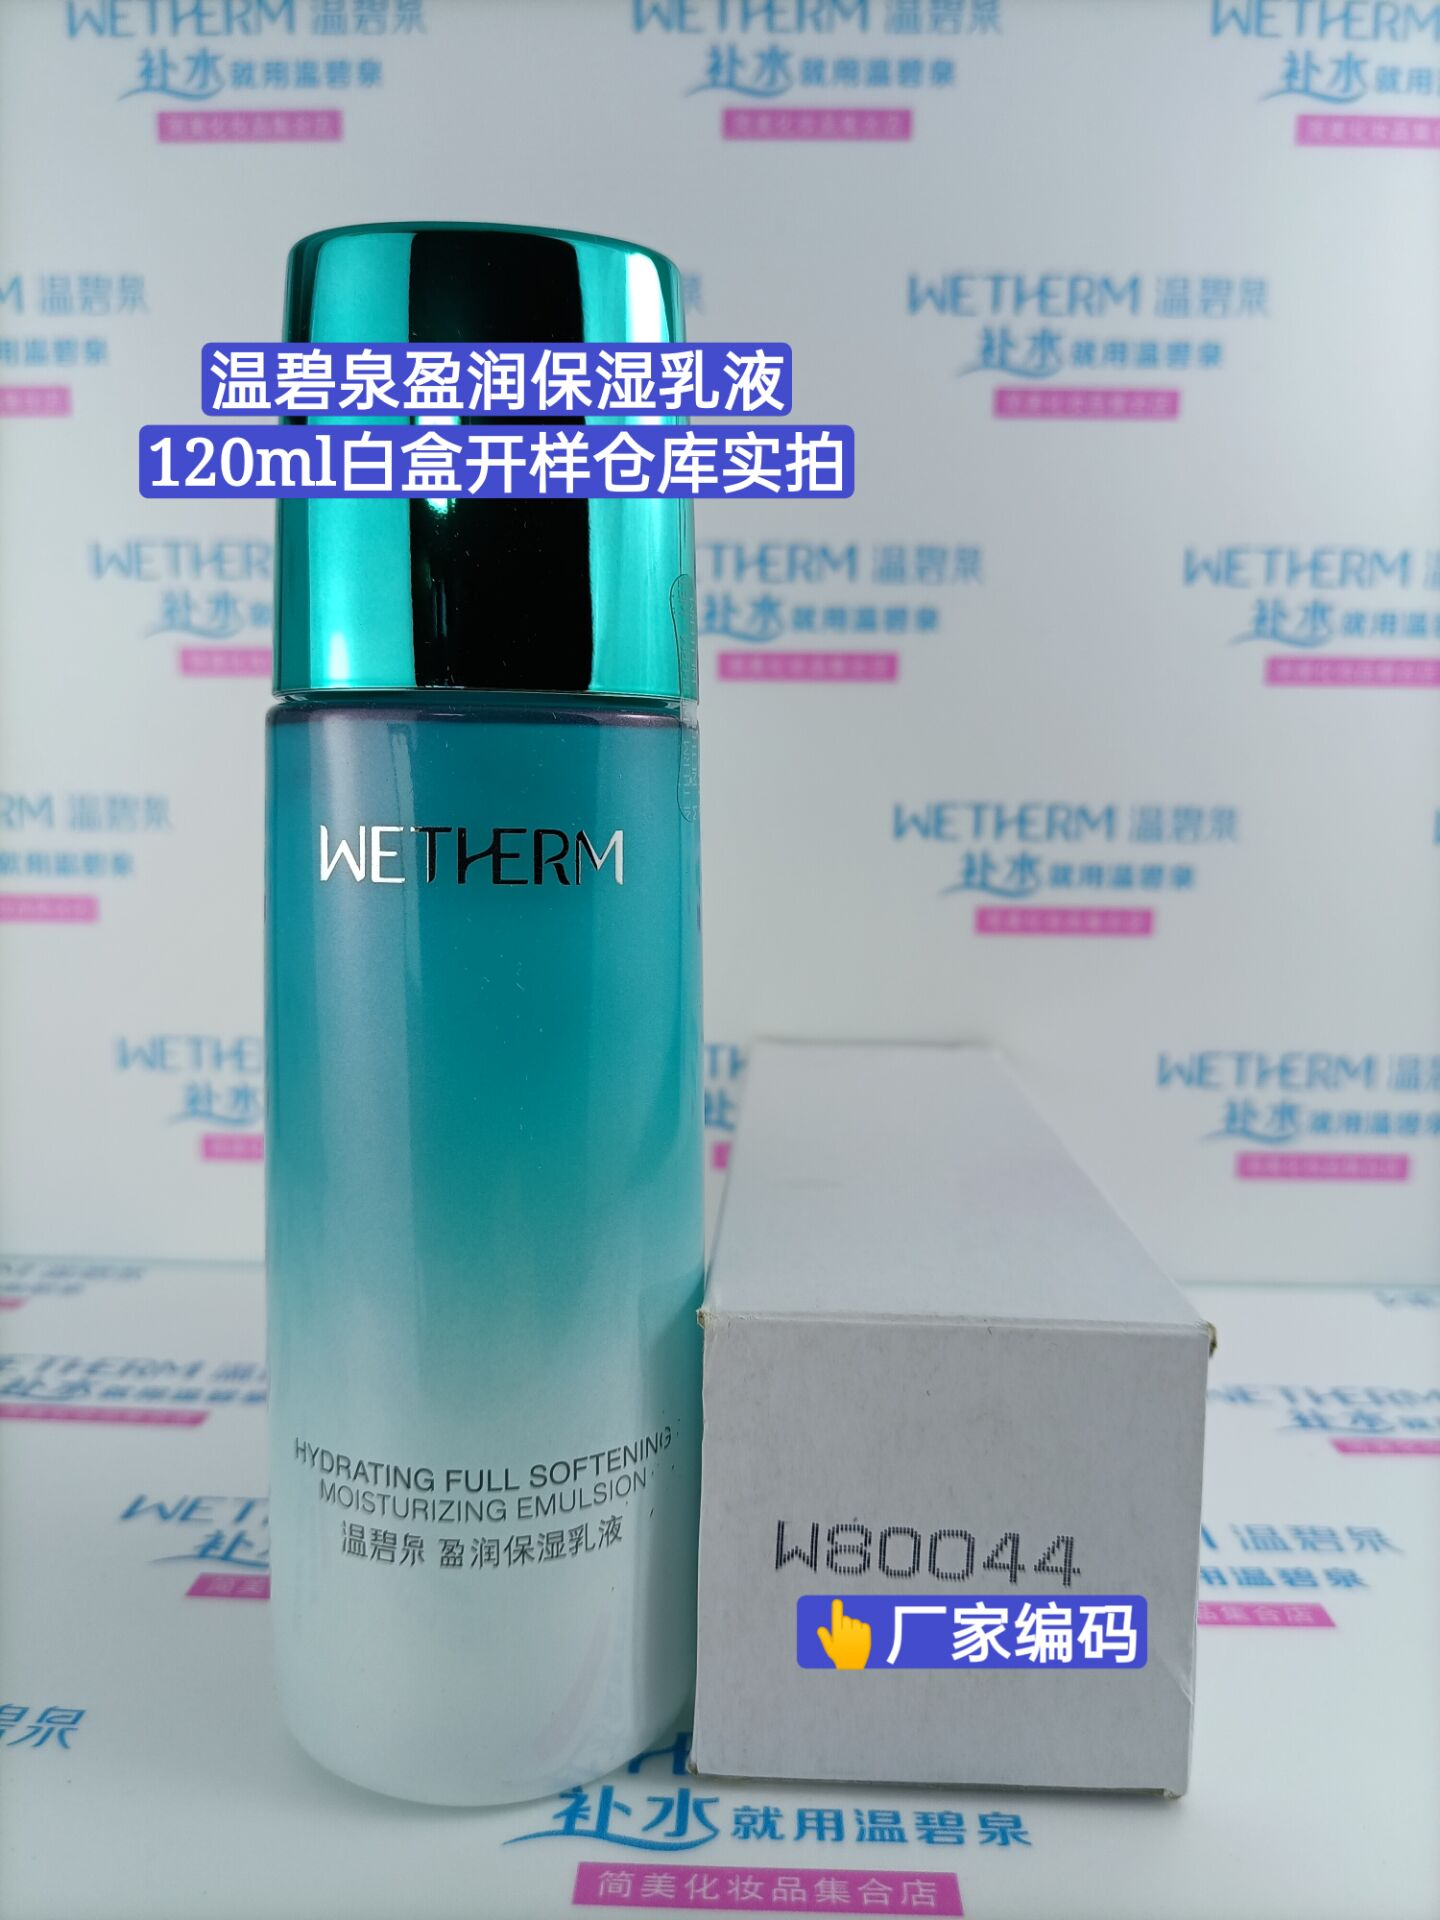 Wen Biquan moistening moisturizing lotion 120g refreshing, non oil, genuine, facial skin care, white box trial, 21-24 years.